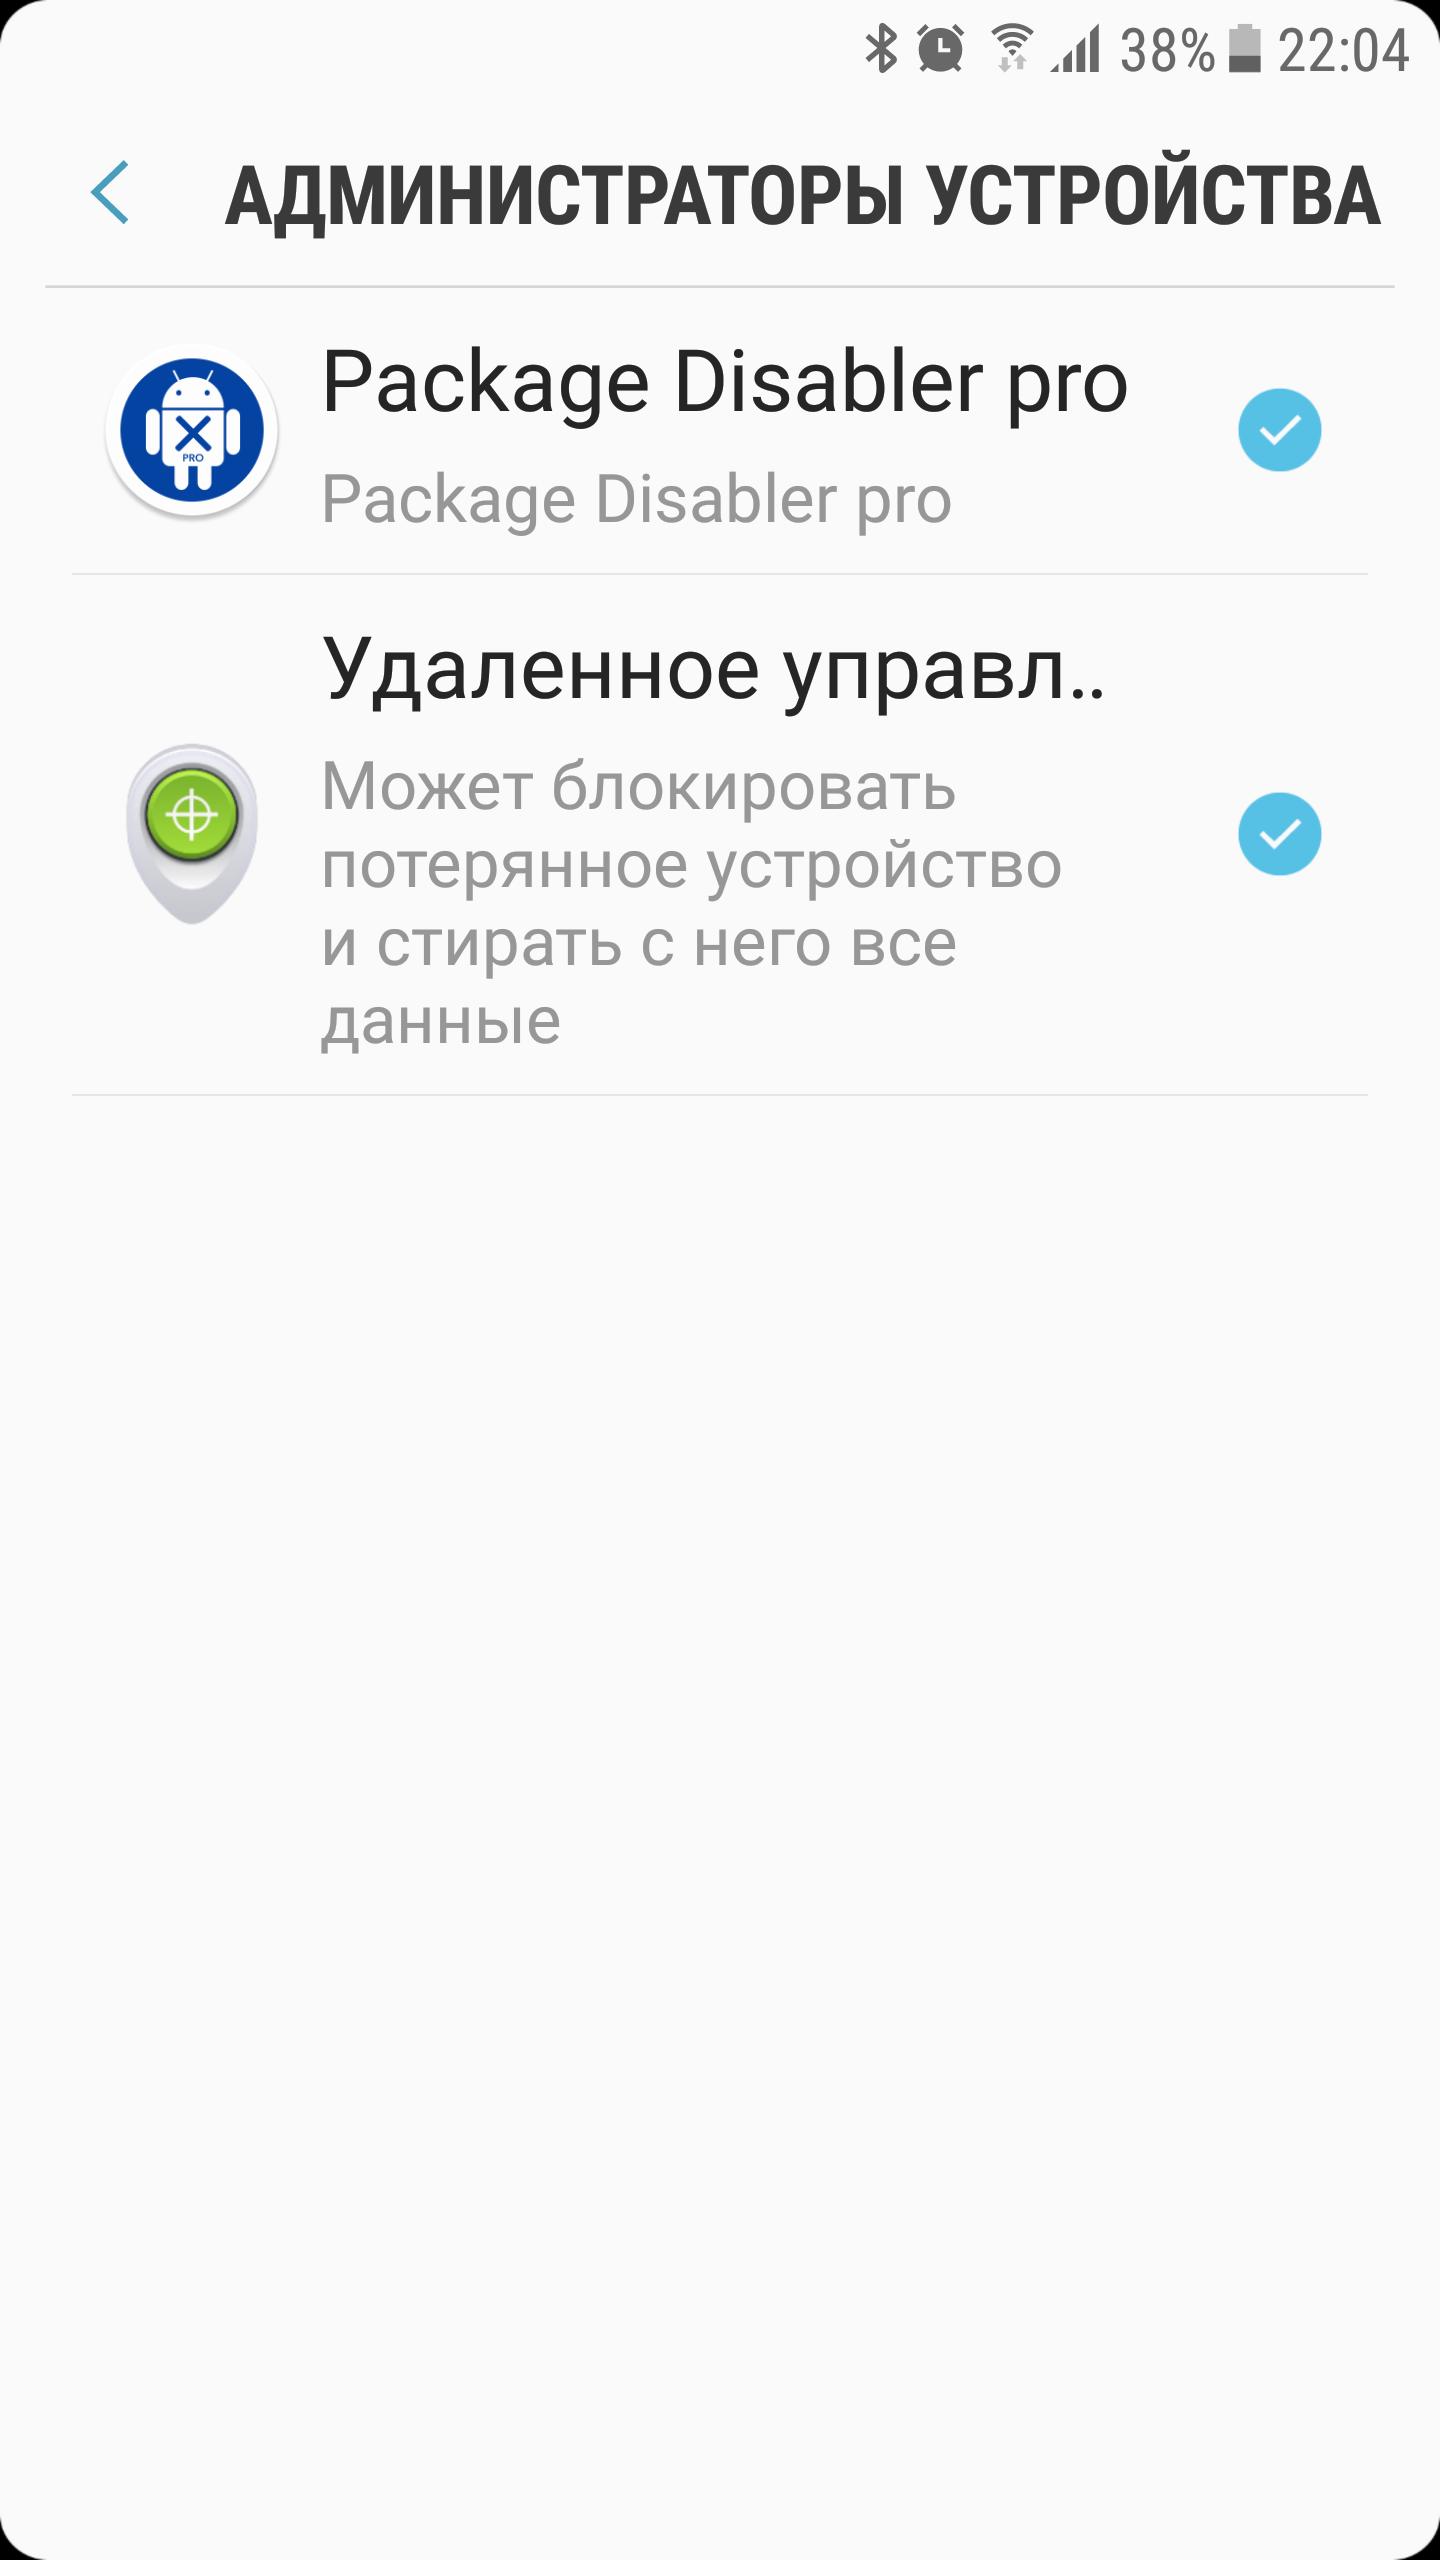 Чистим систему без ущерба для Samsung Pay и Android Pay